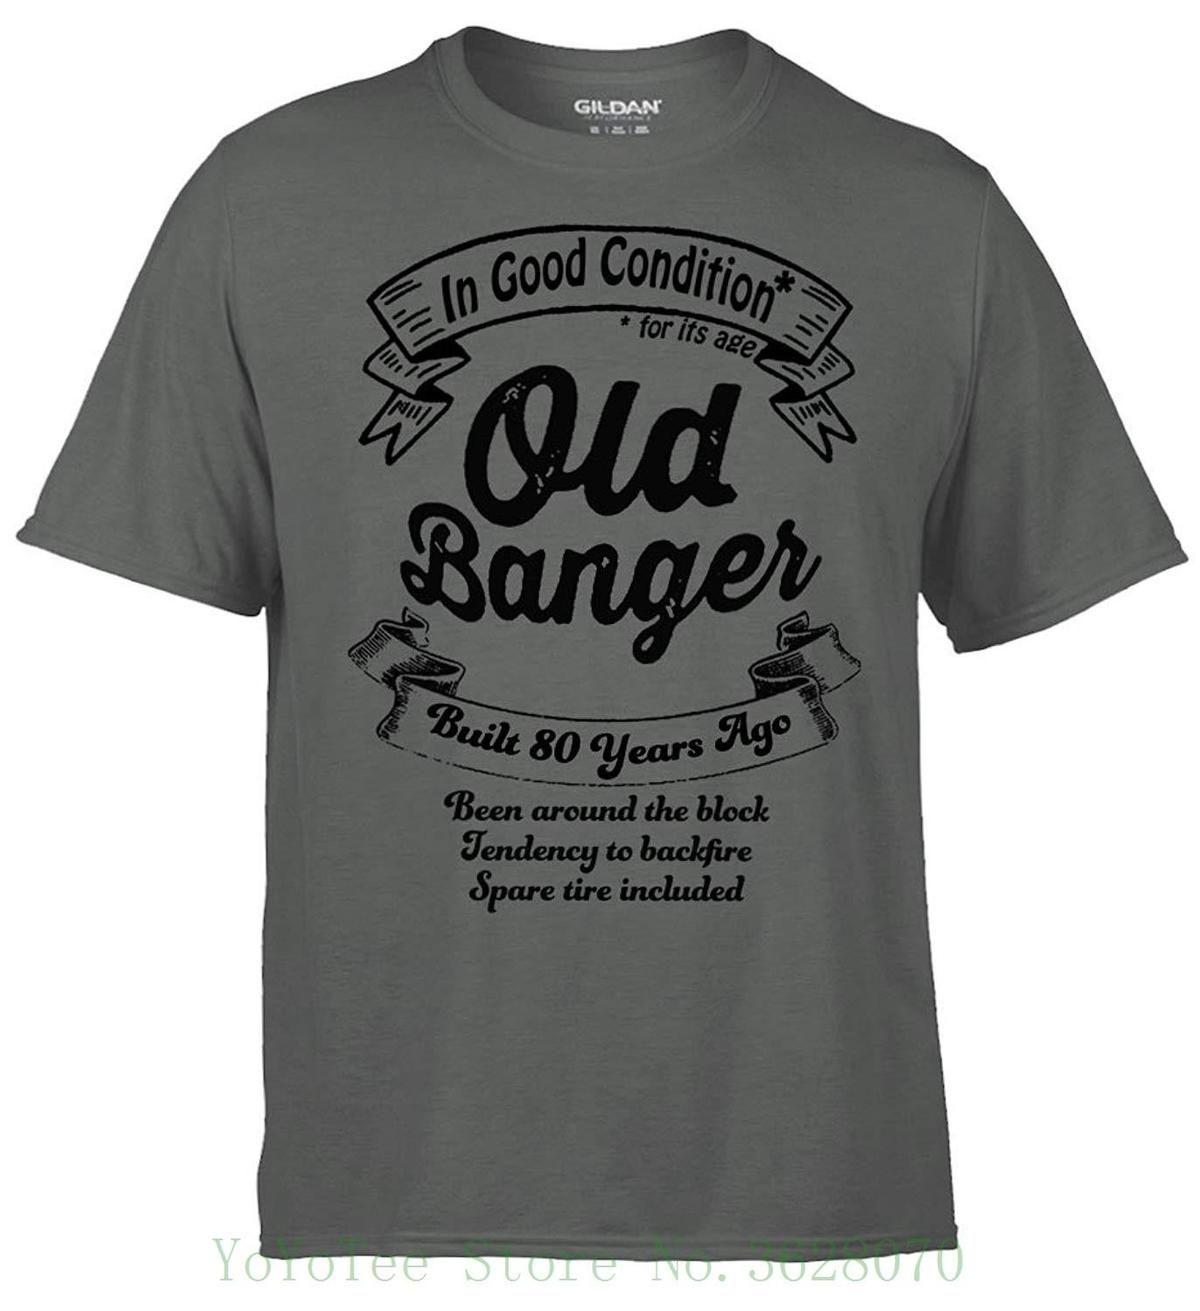 Brandevo 80th Birthday Mens T Shirt Old Banger Charcoal Grey Fun Quality Present MenS O Neck Printed Tee Shirts And